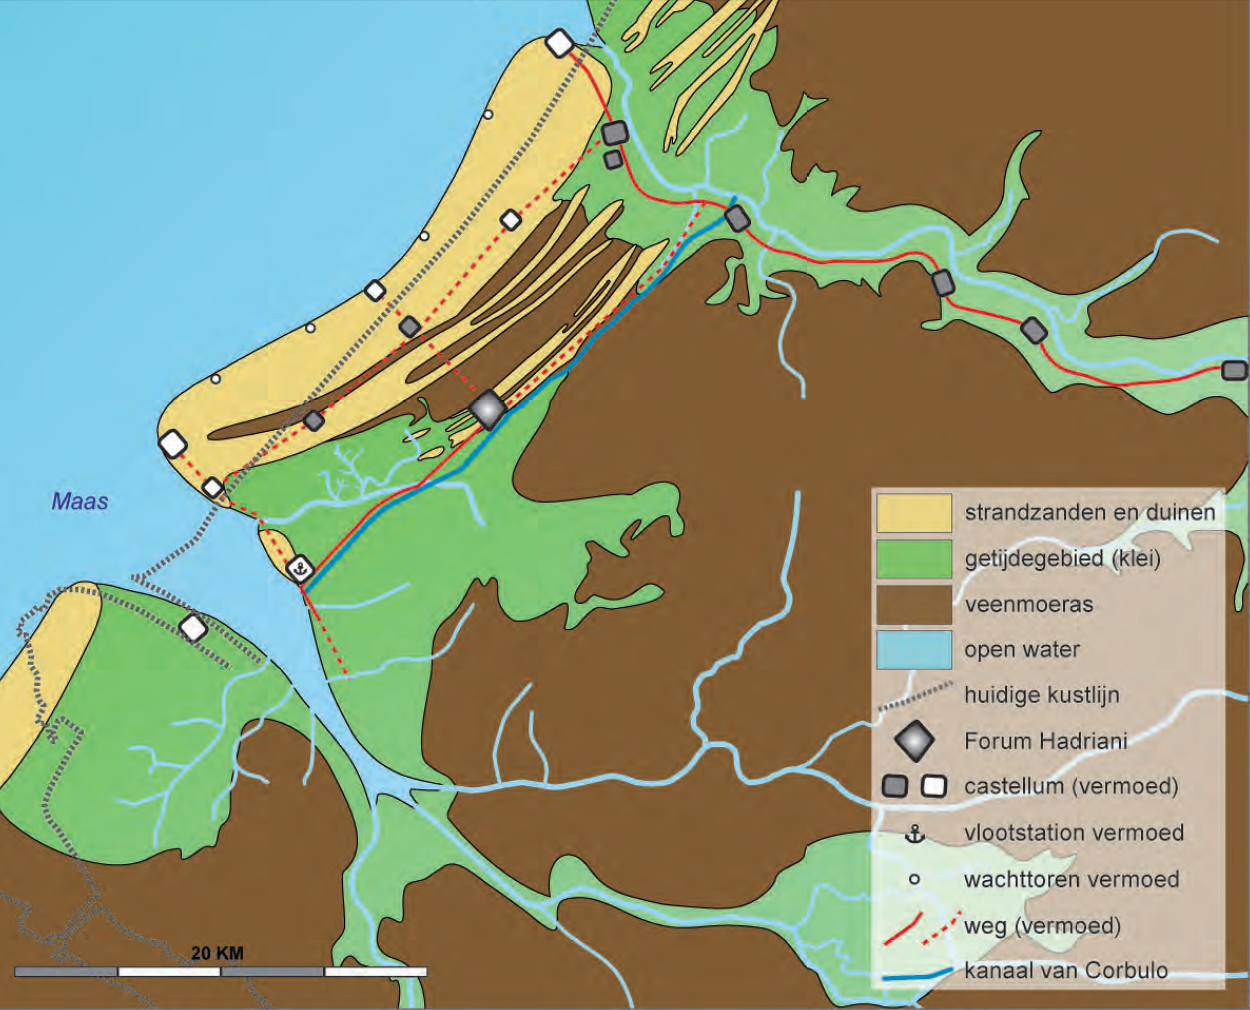 De kust tussen Maas en Rijn in de Romeinse tijd. (A. Waasdorp)